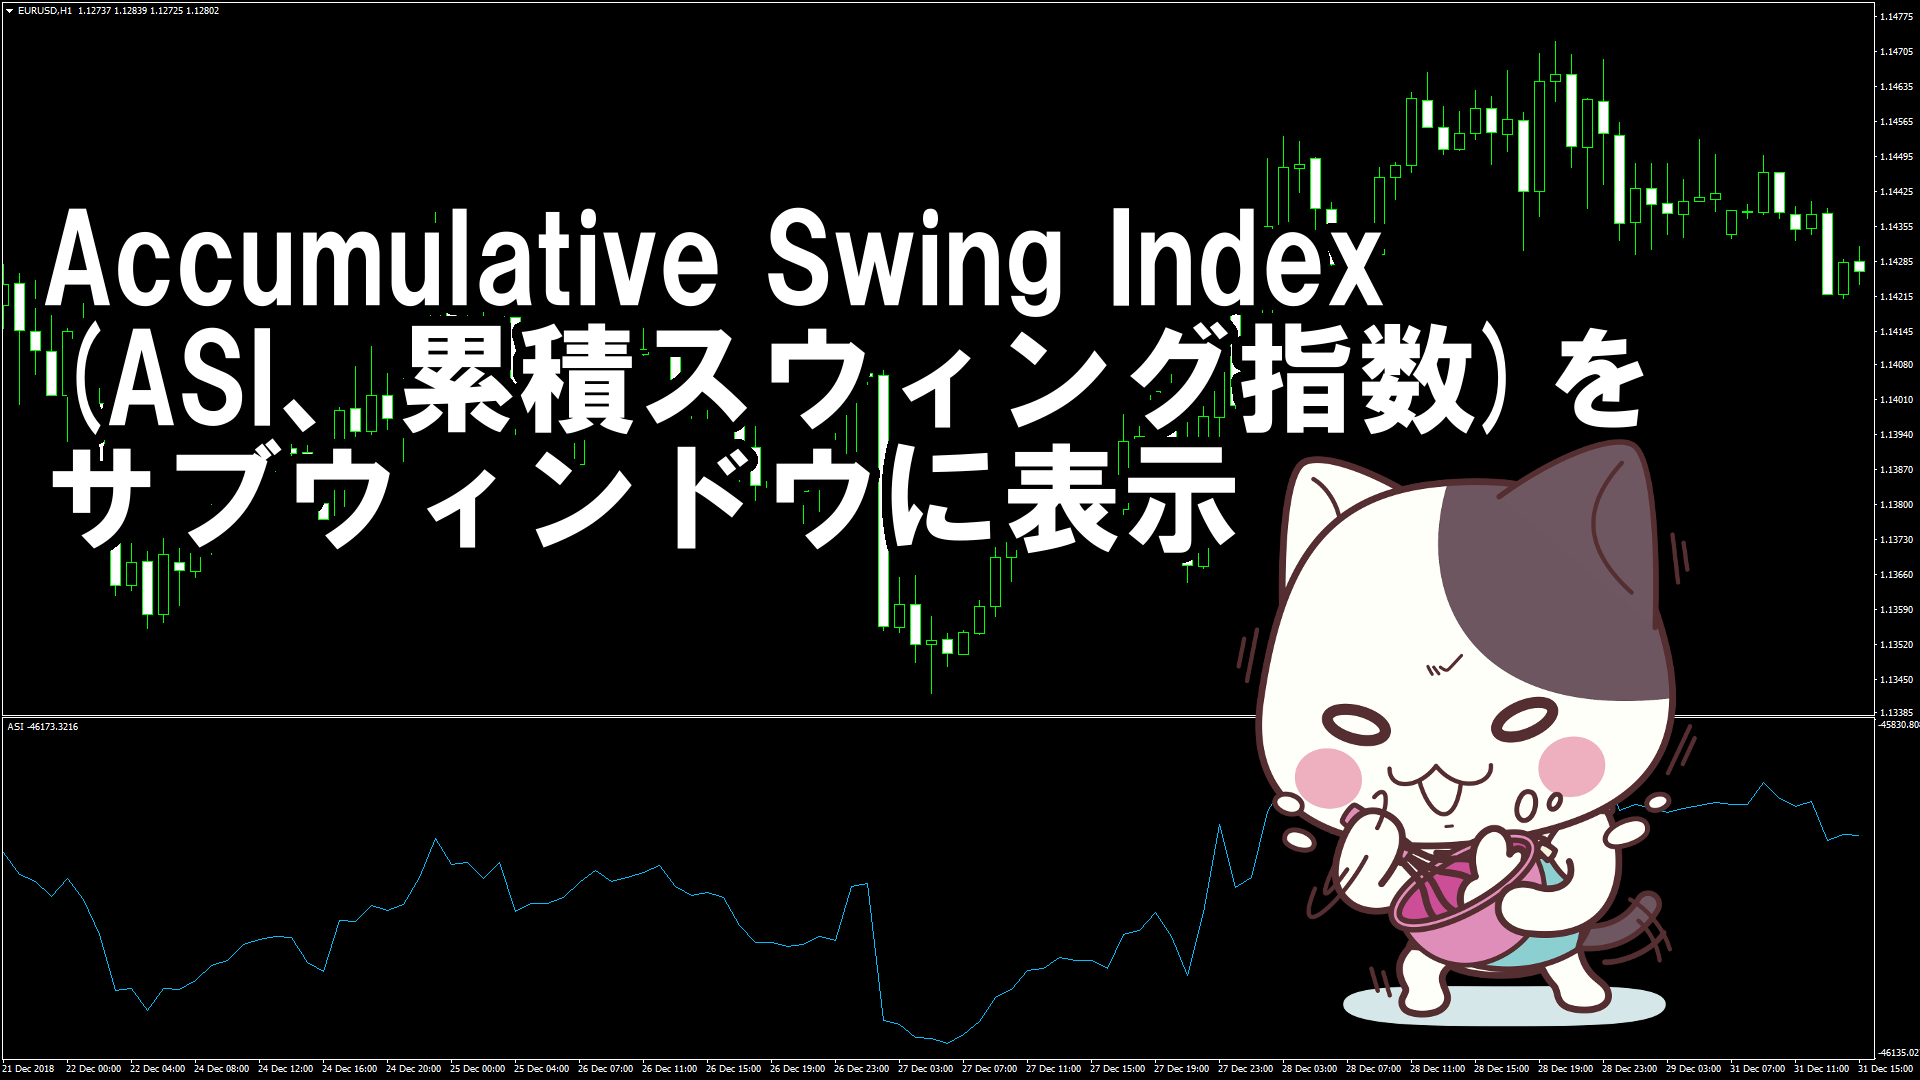 Accumulative Swing Index(ASI、累積スウィング指数)をサブウィンドウに表示するMT4インジケーター『ASI』